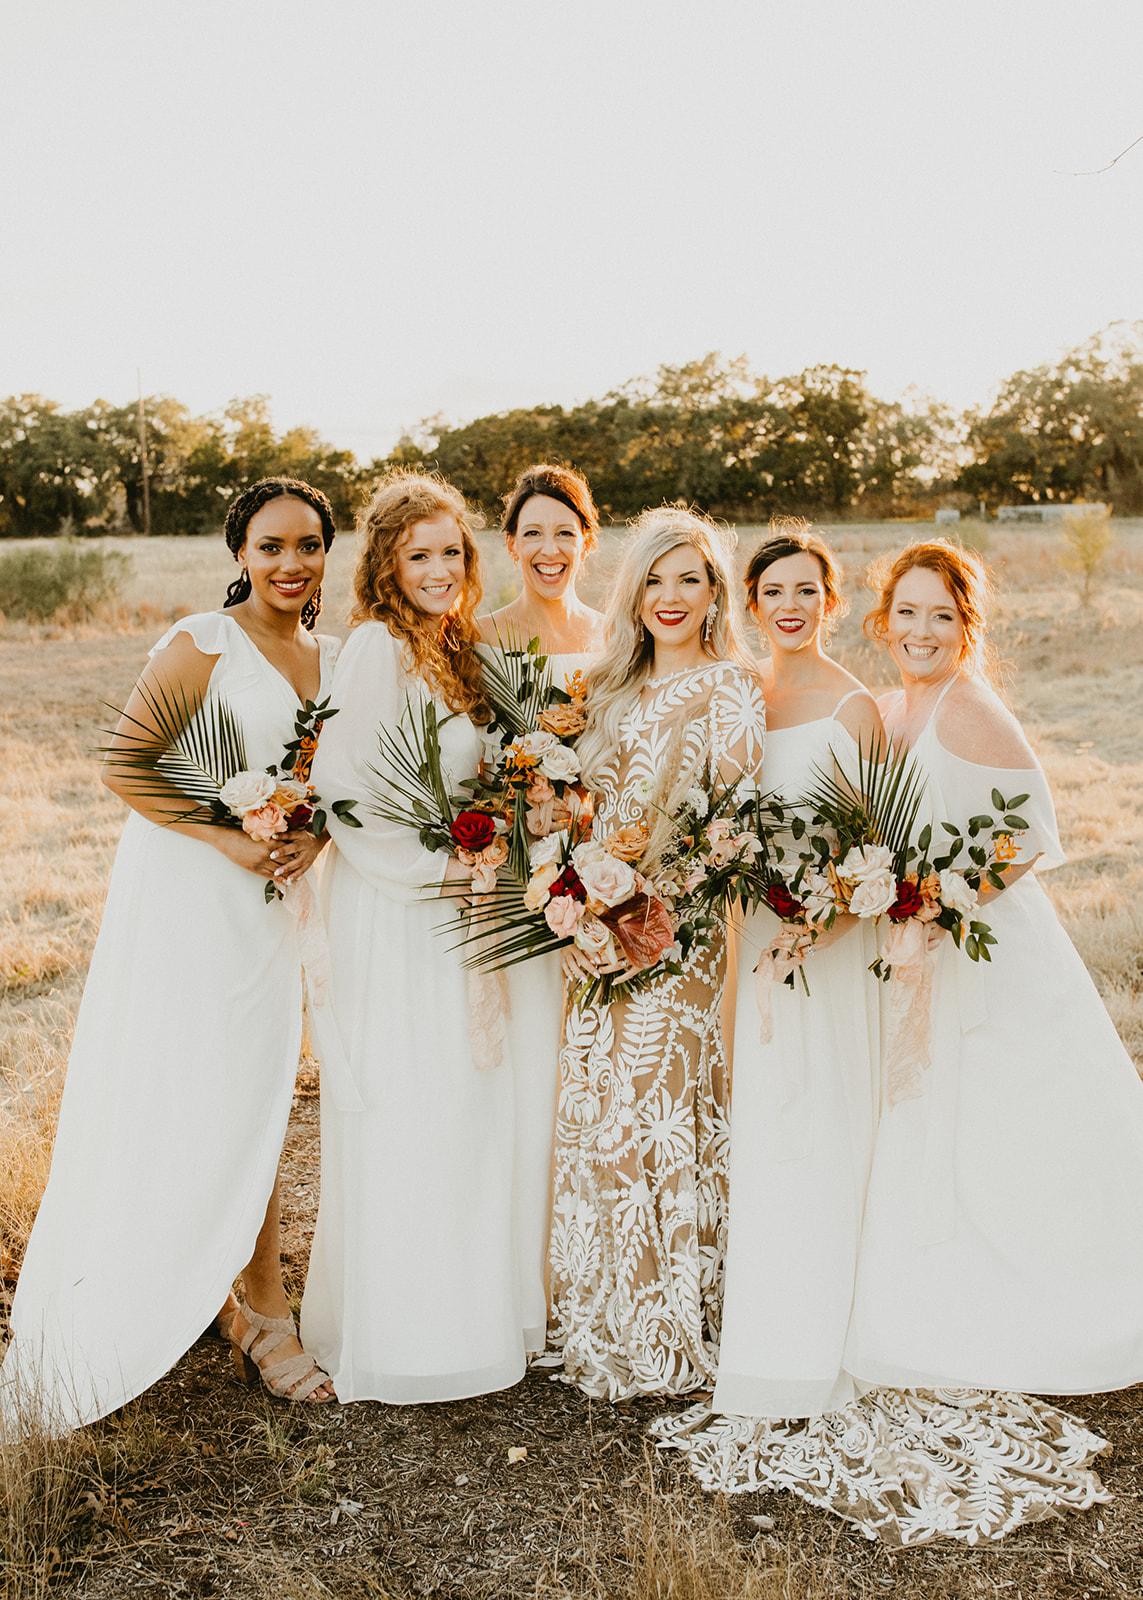 Tropical Colorful Frond Bridesmaid + Bride Bouquets + White Creamy Bridesmaid Dresses + Rue De Seine Wedding Dress + Boho Wedding + Wedding coordinator Planner Epoch Co+